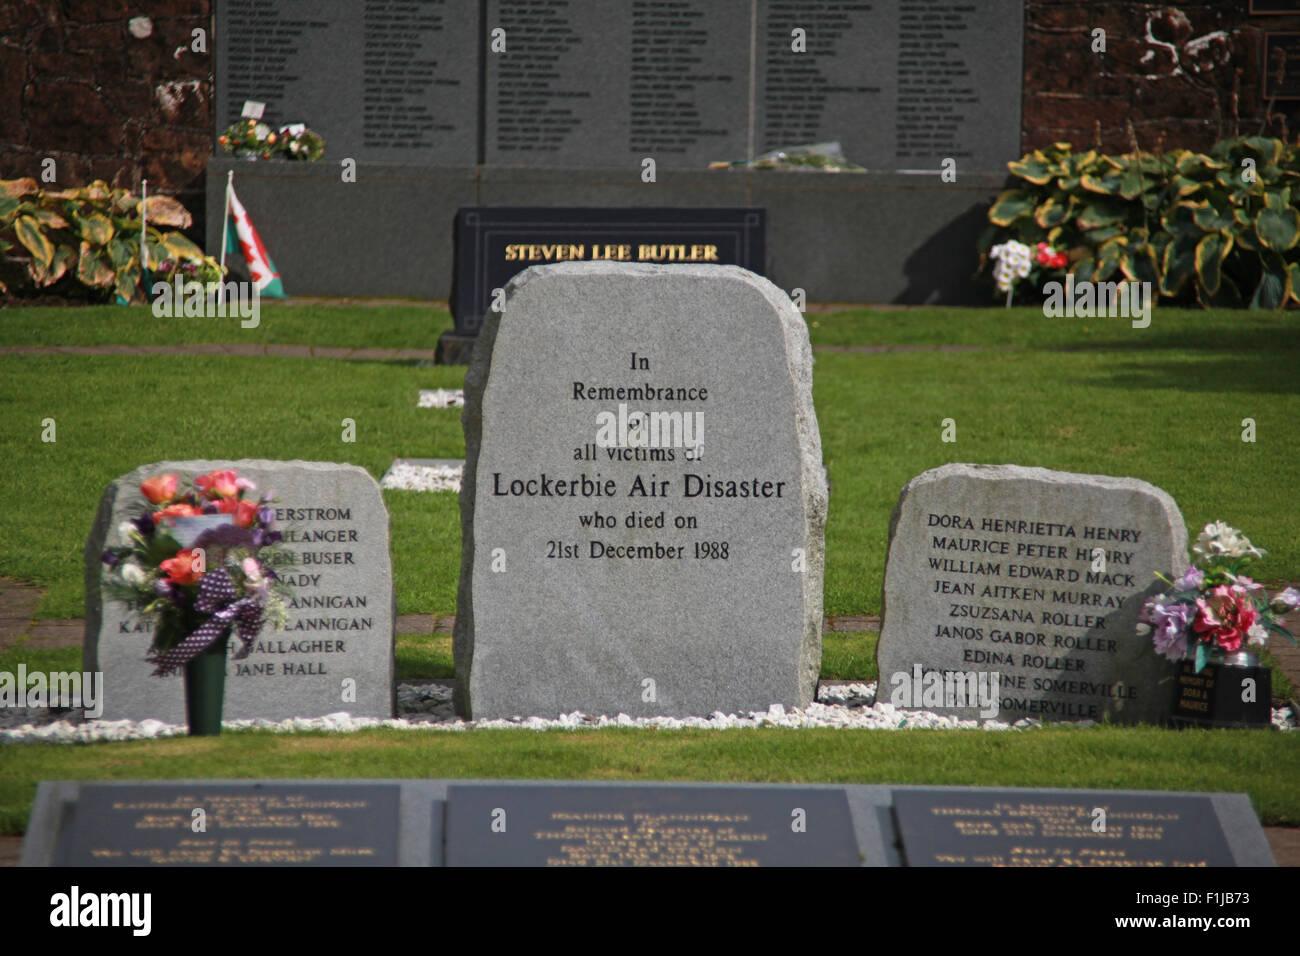 Lockerbie PanAm103 In Rememberance Memorial Stone Garden, Scotland - Stock Image